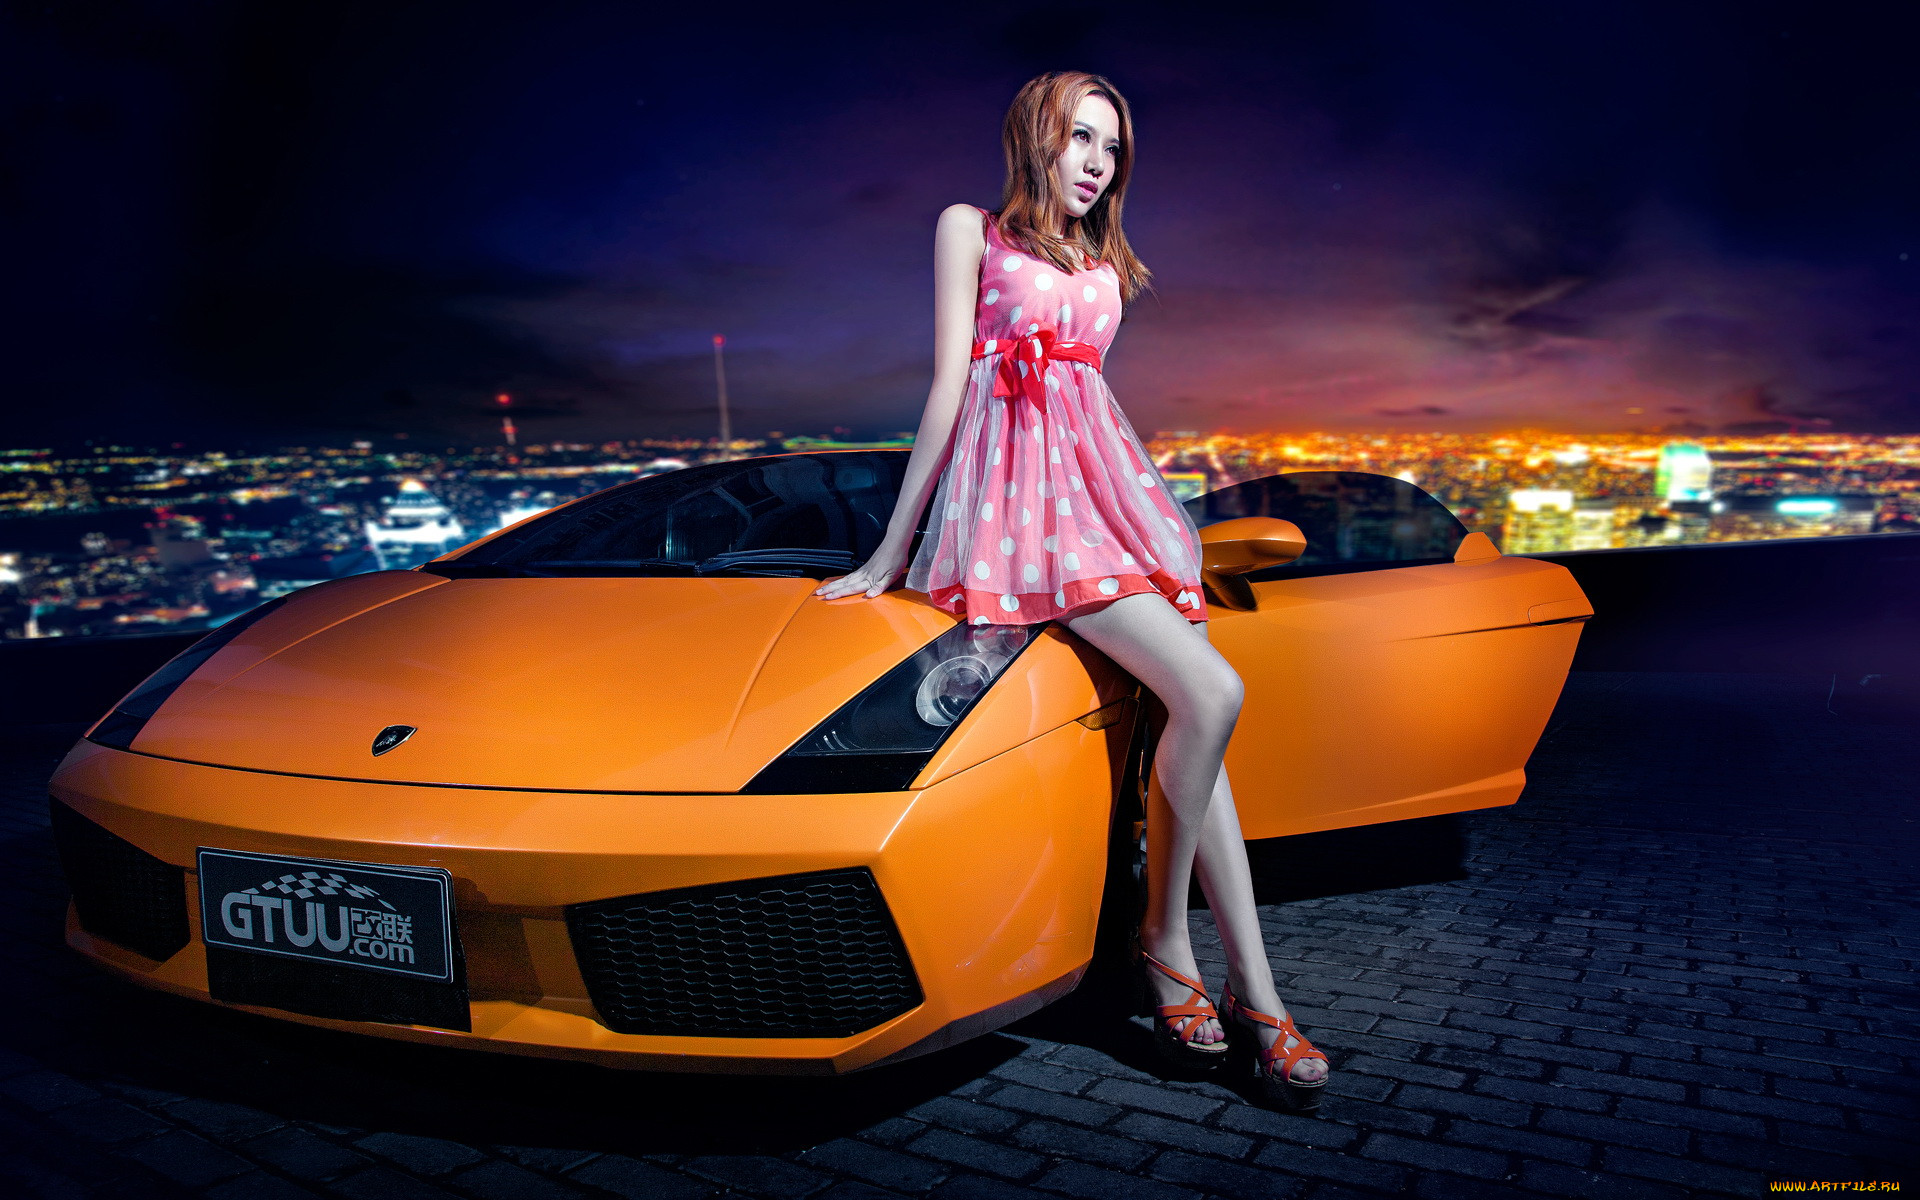 Картинки девушек и машин на обои